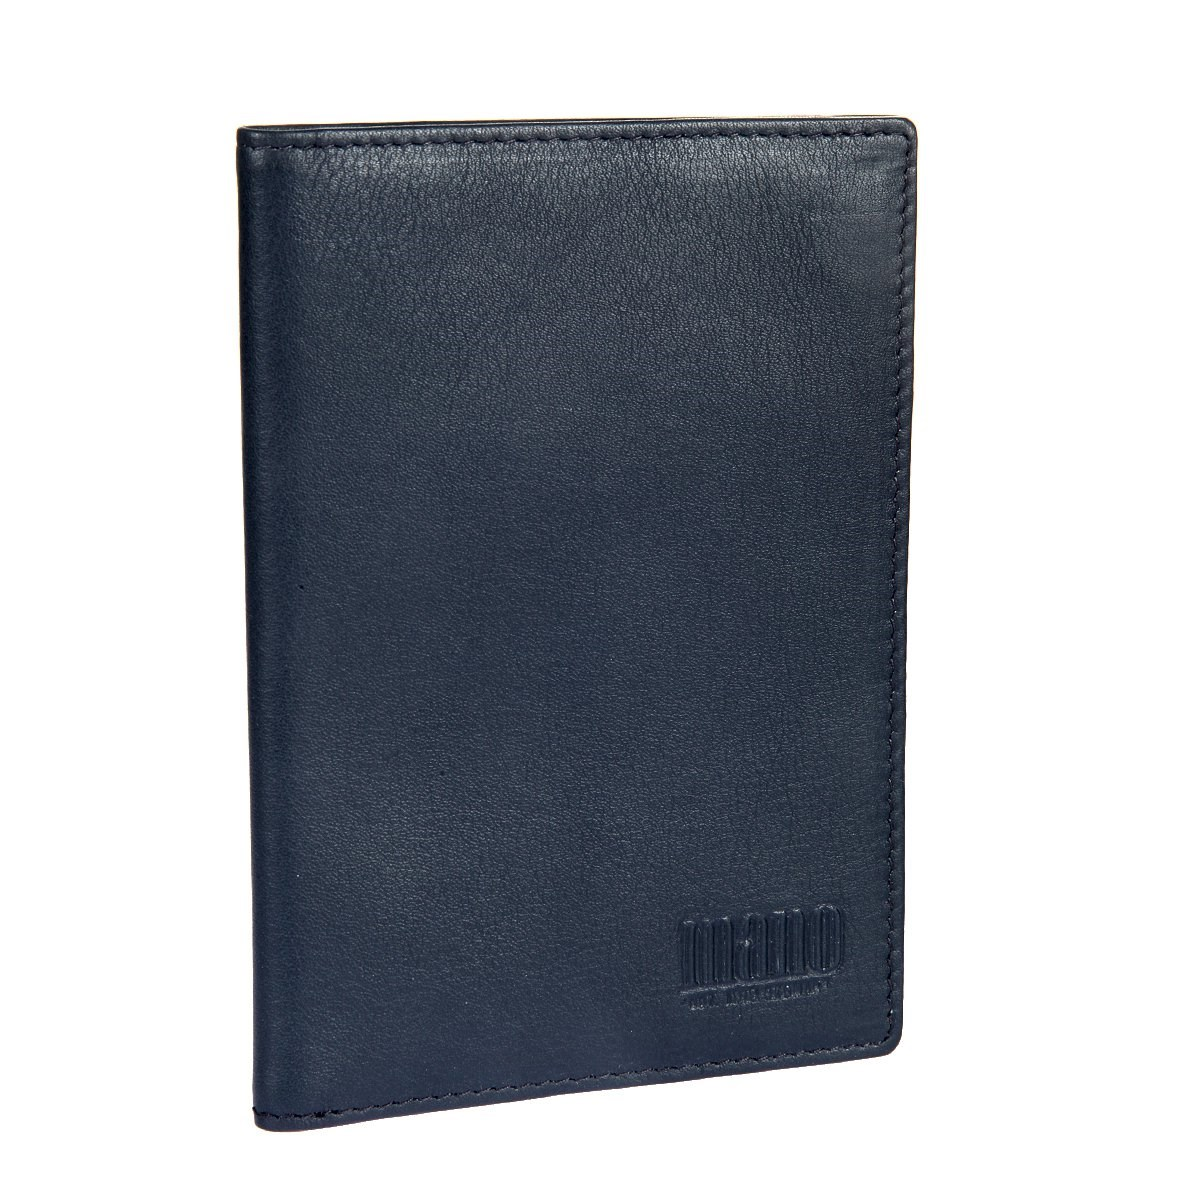 Passport covers Mano 20104 SETRU dark blue кошелек mano 20103 setru kobald blue